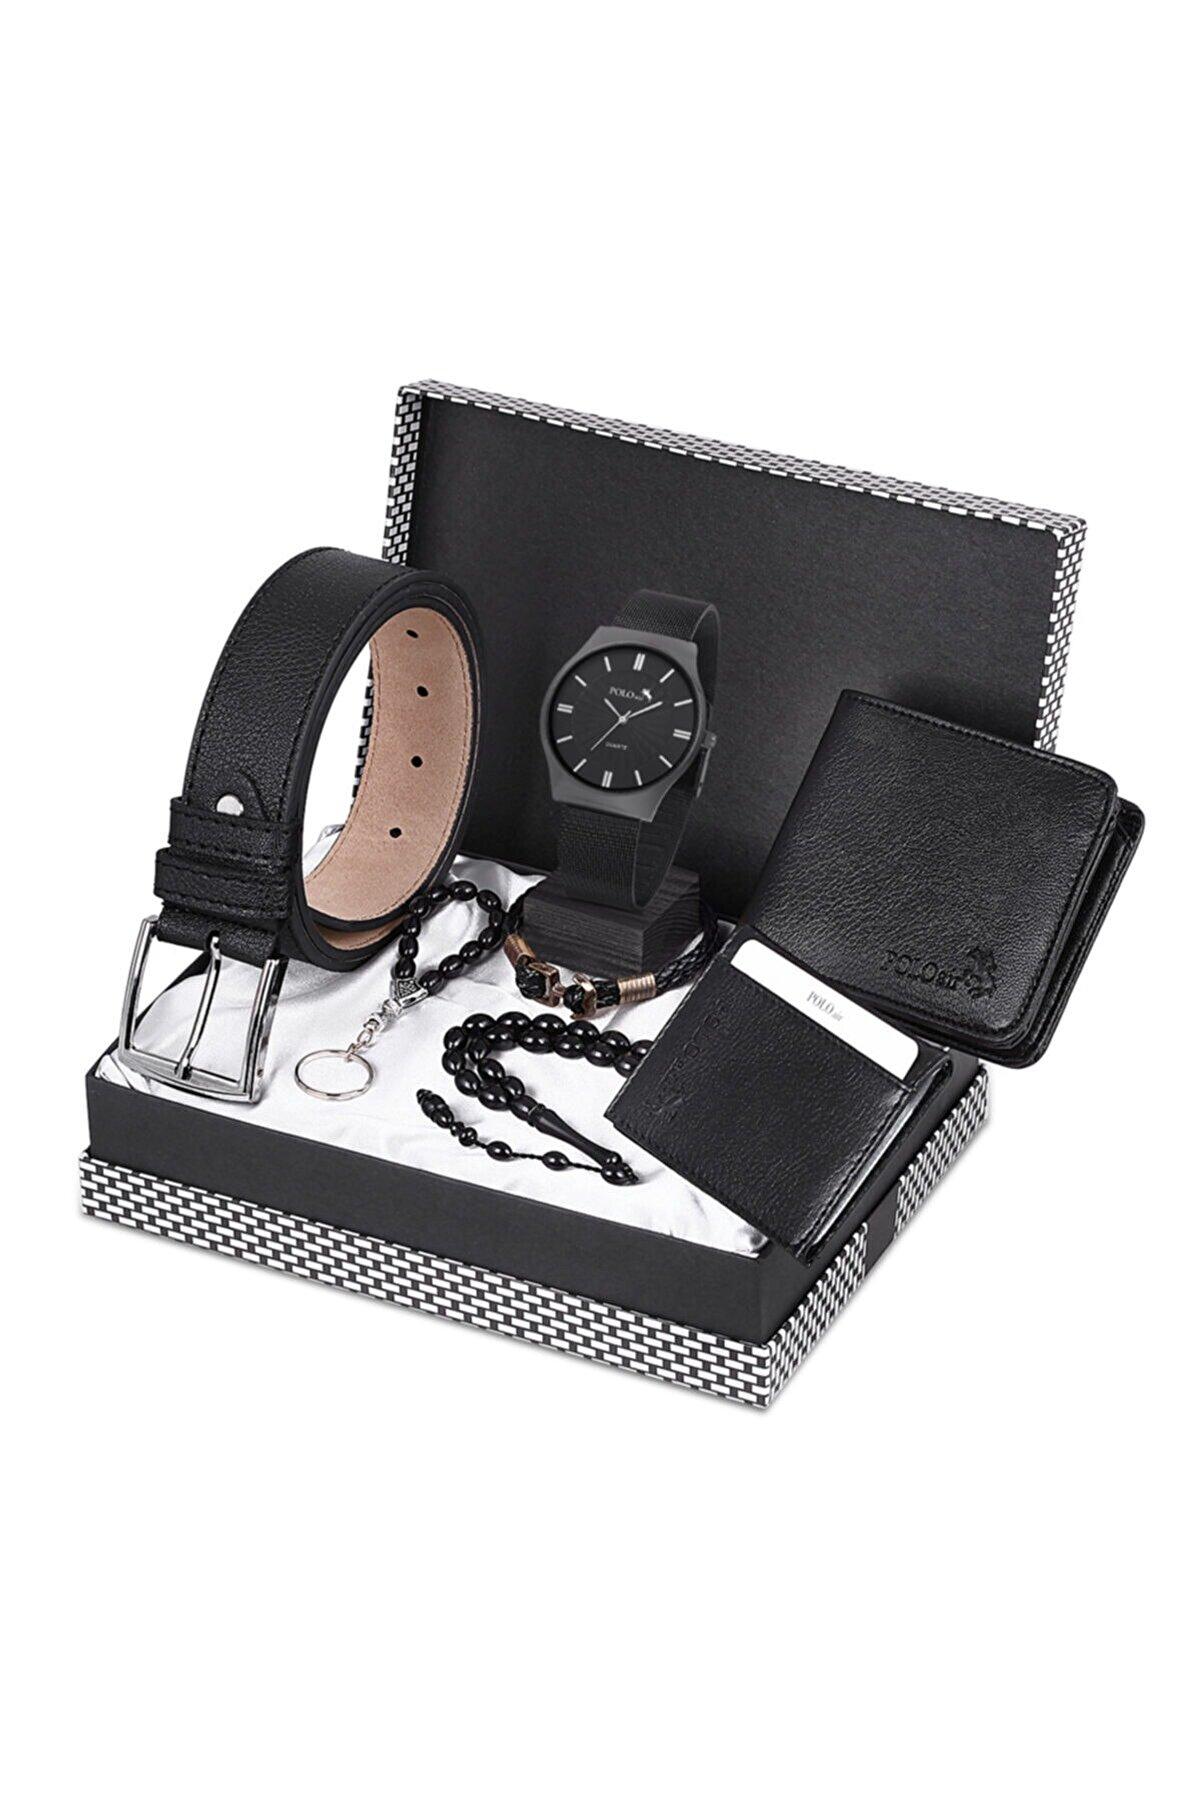 polo air Erkek Set Kol Saati +Kemer+ Cüzdan +Kartlık +Tesbih +Anahtarlık Seti